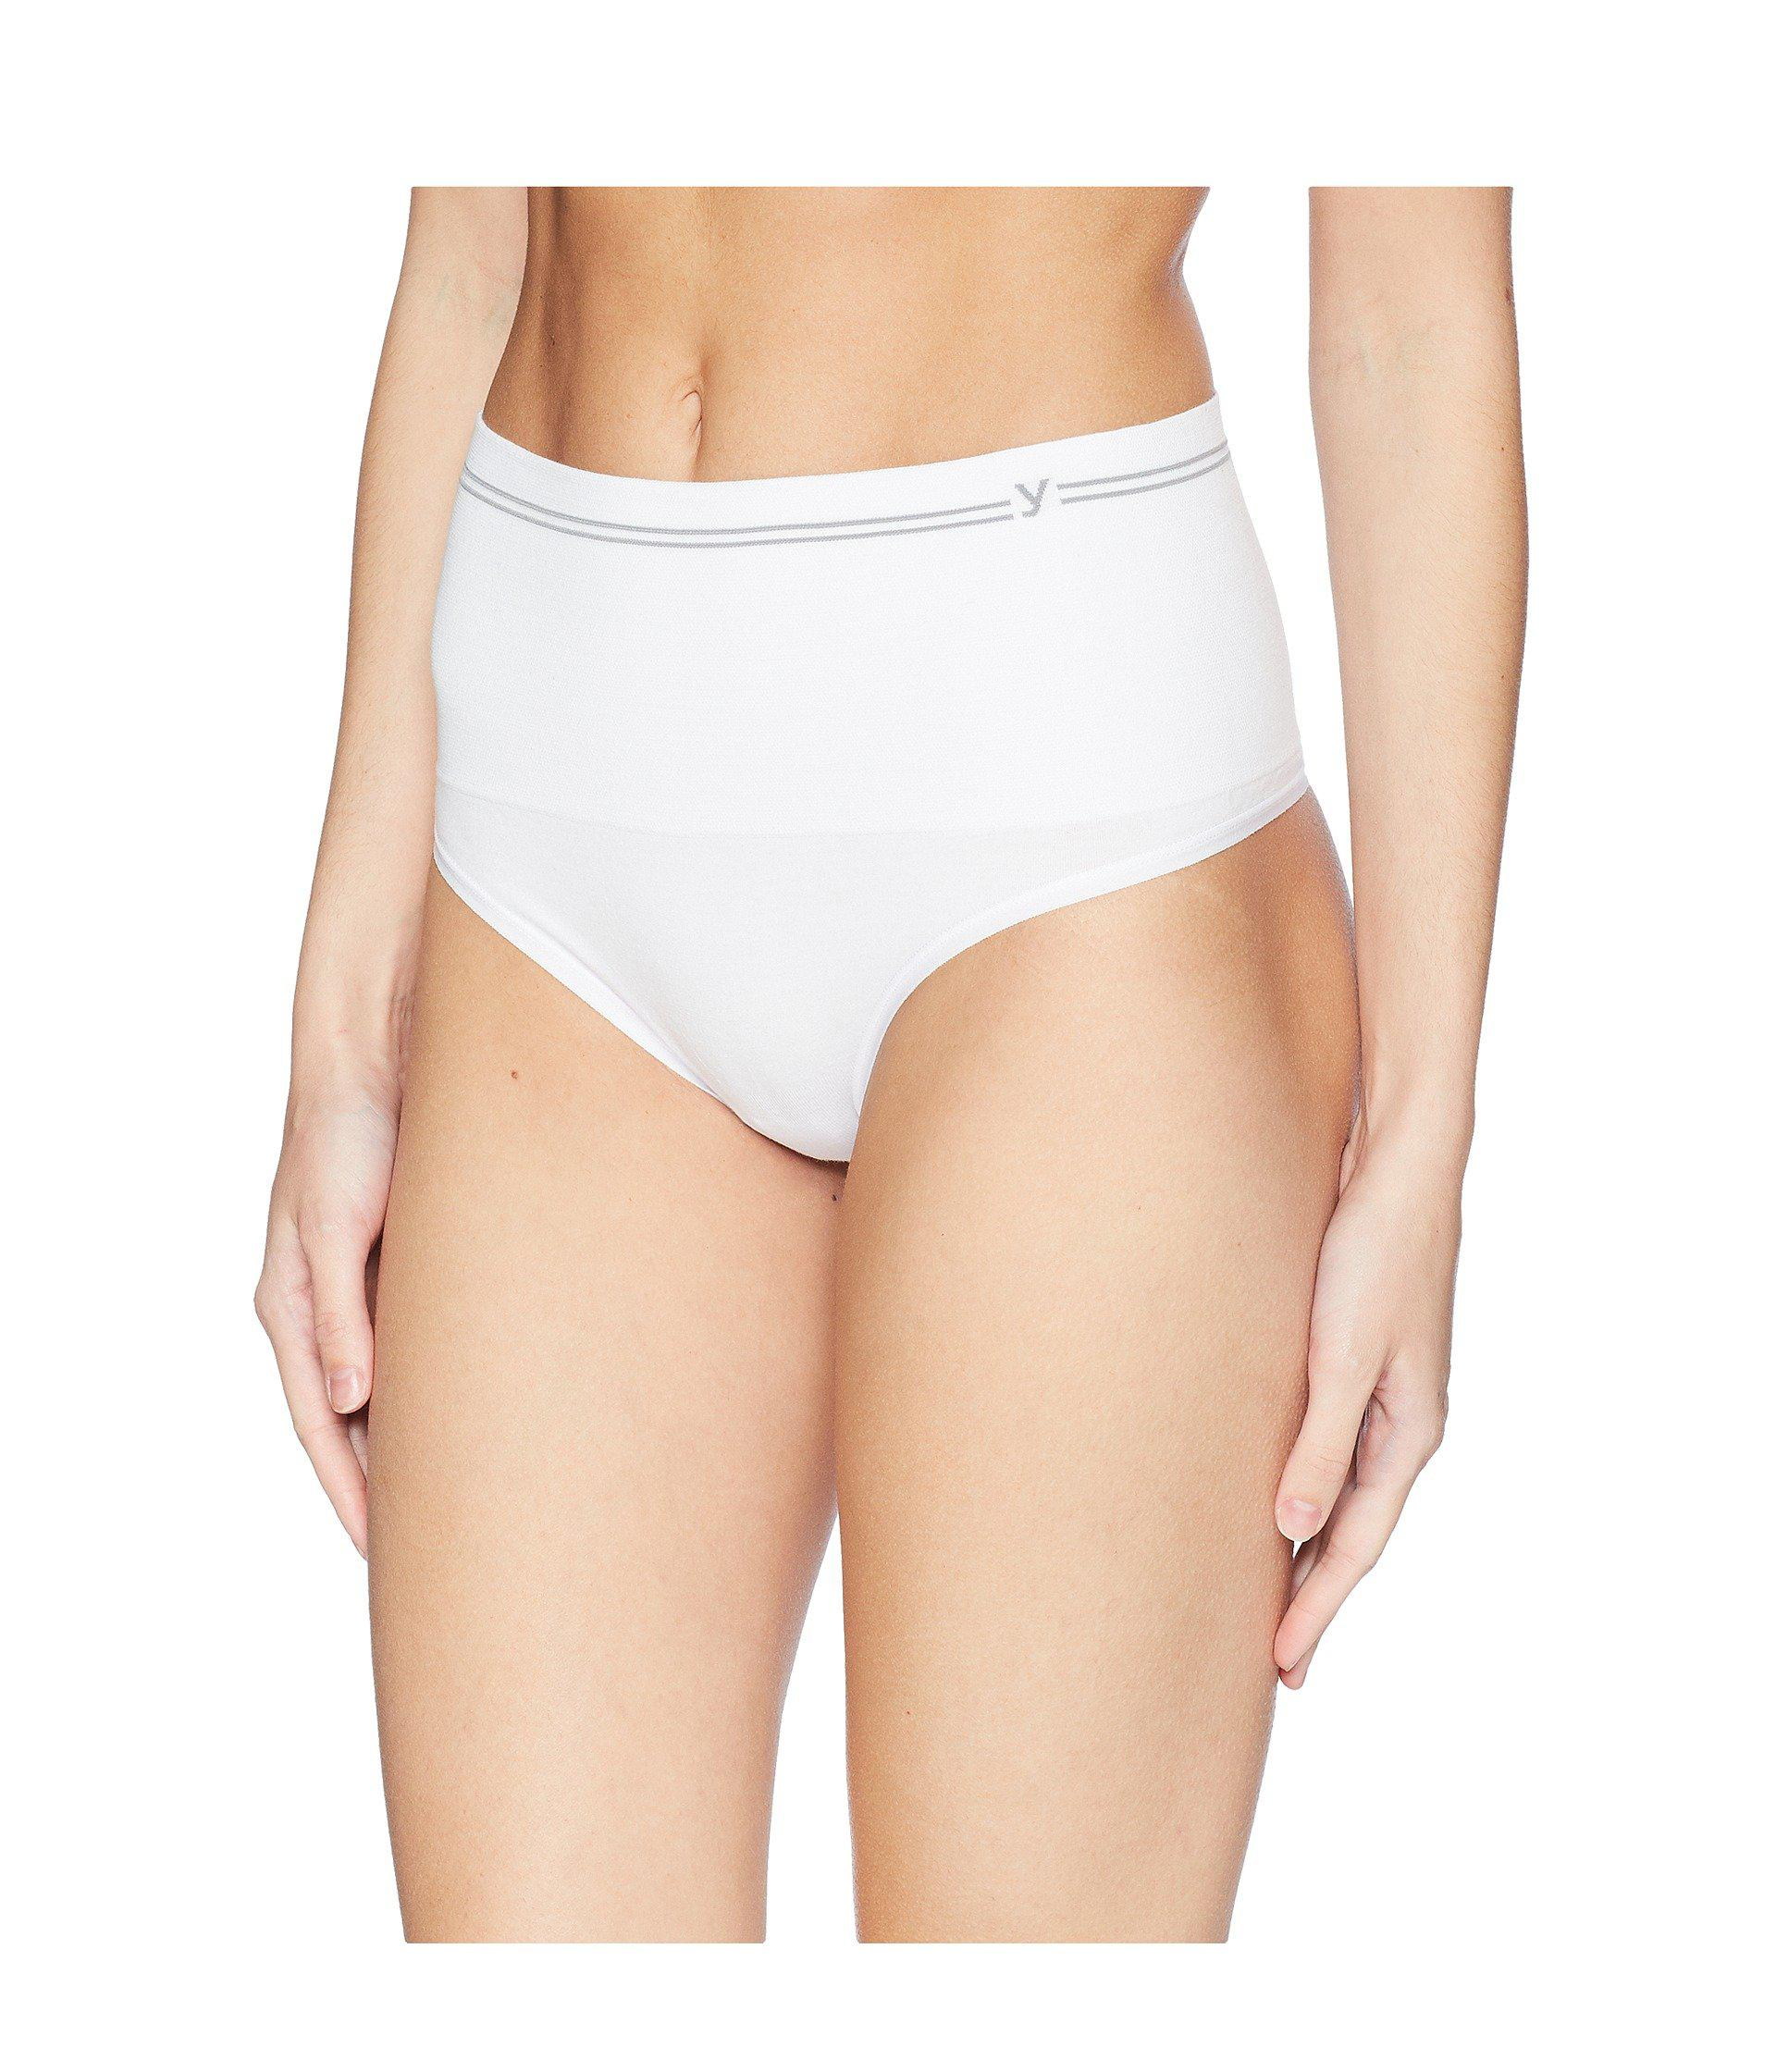 695647f8cb761 Lyst - Yummie Cotton Seamless Shaping Thong (black) Women s Underwear in  White